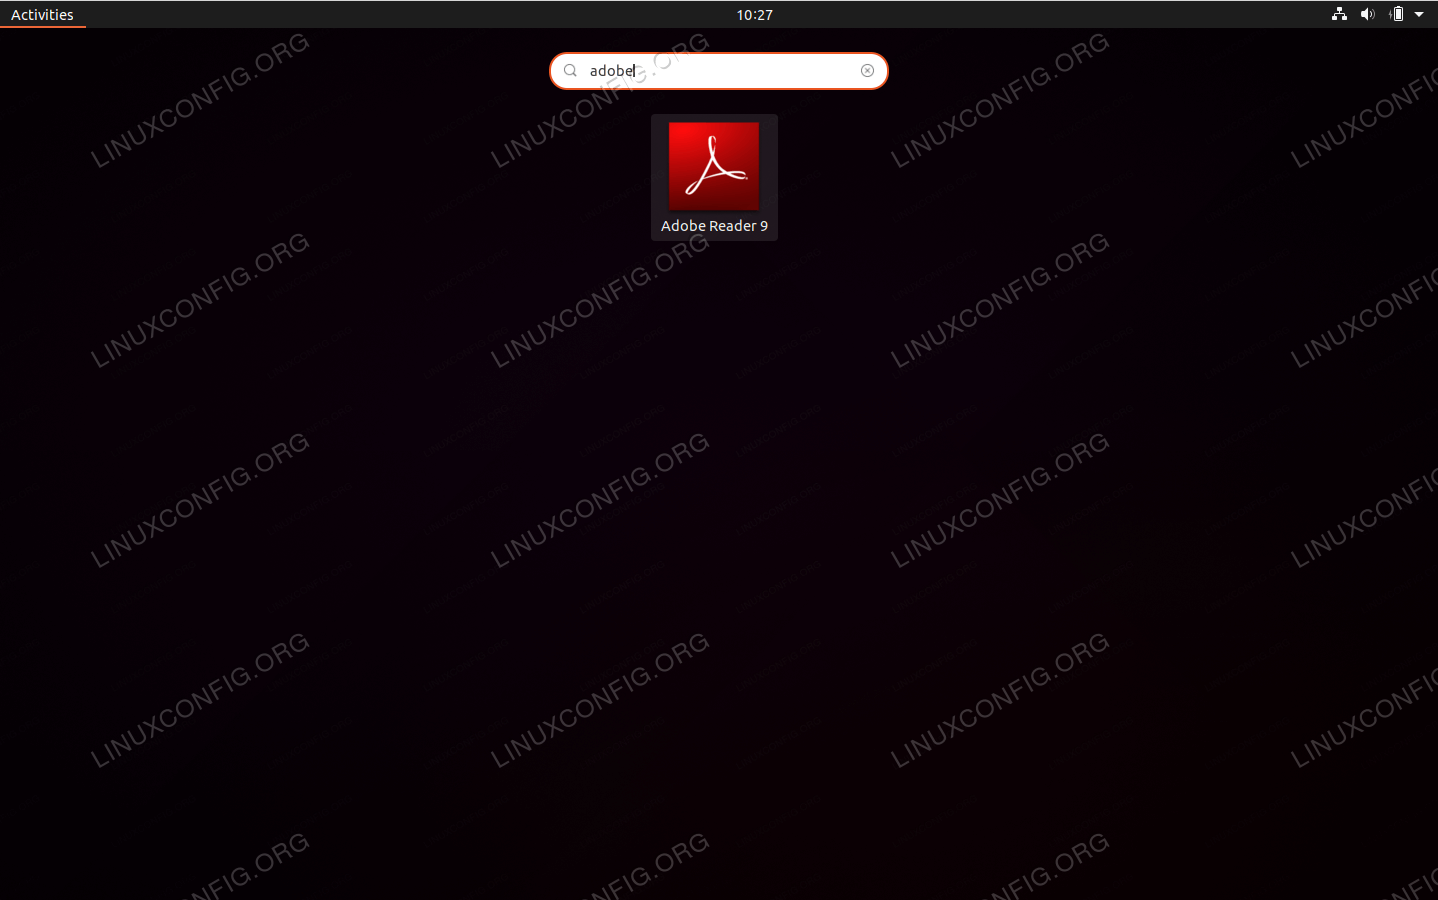 Launch Adobe Acrobat Reader on Ubuntu 20.04